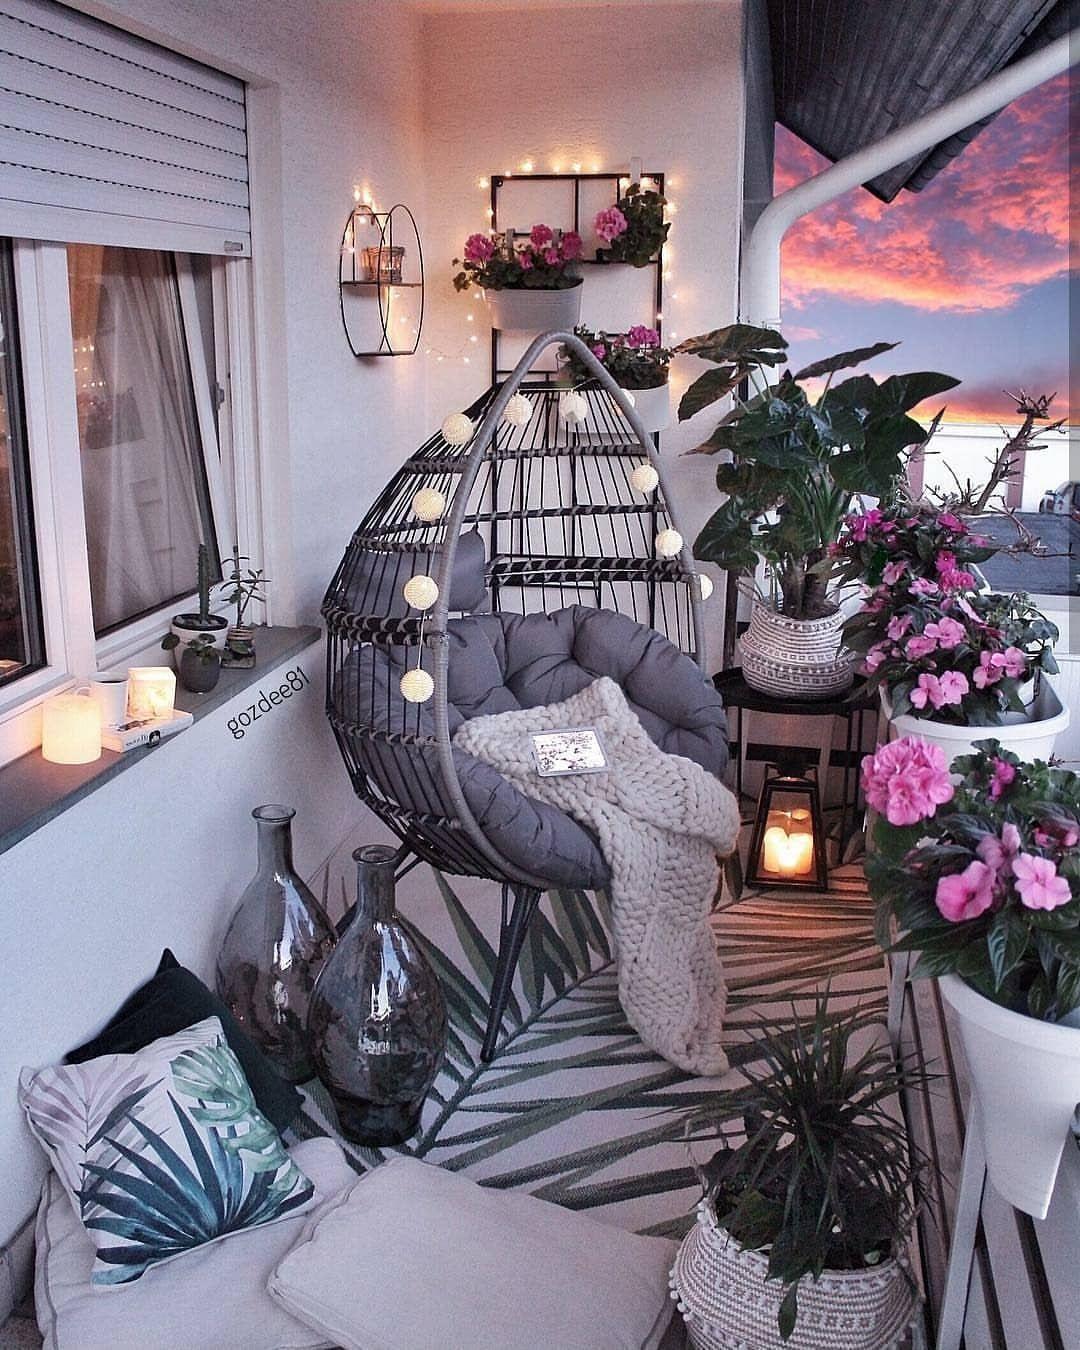 chillvibes 💞🎈 ❤ 💖✨✨ Pinterest:@xymne  Apartment balcony